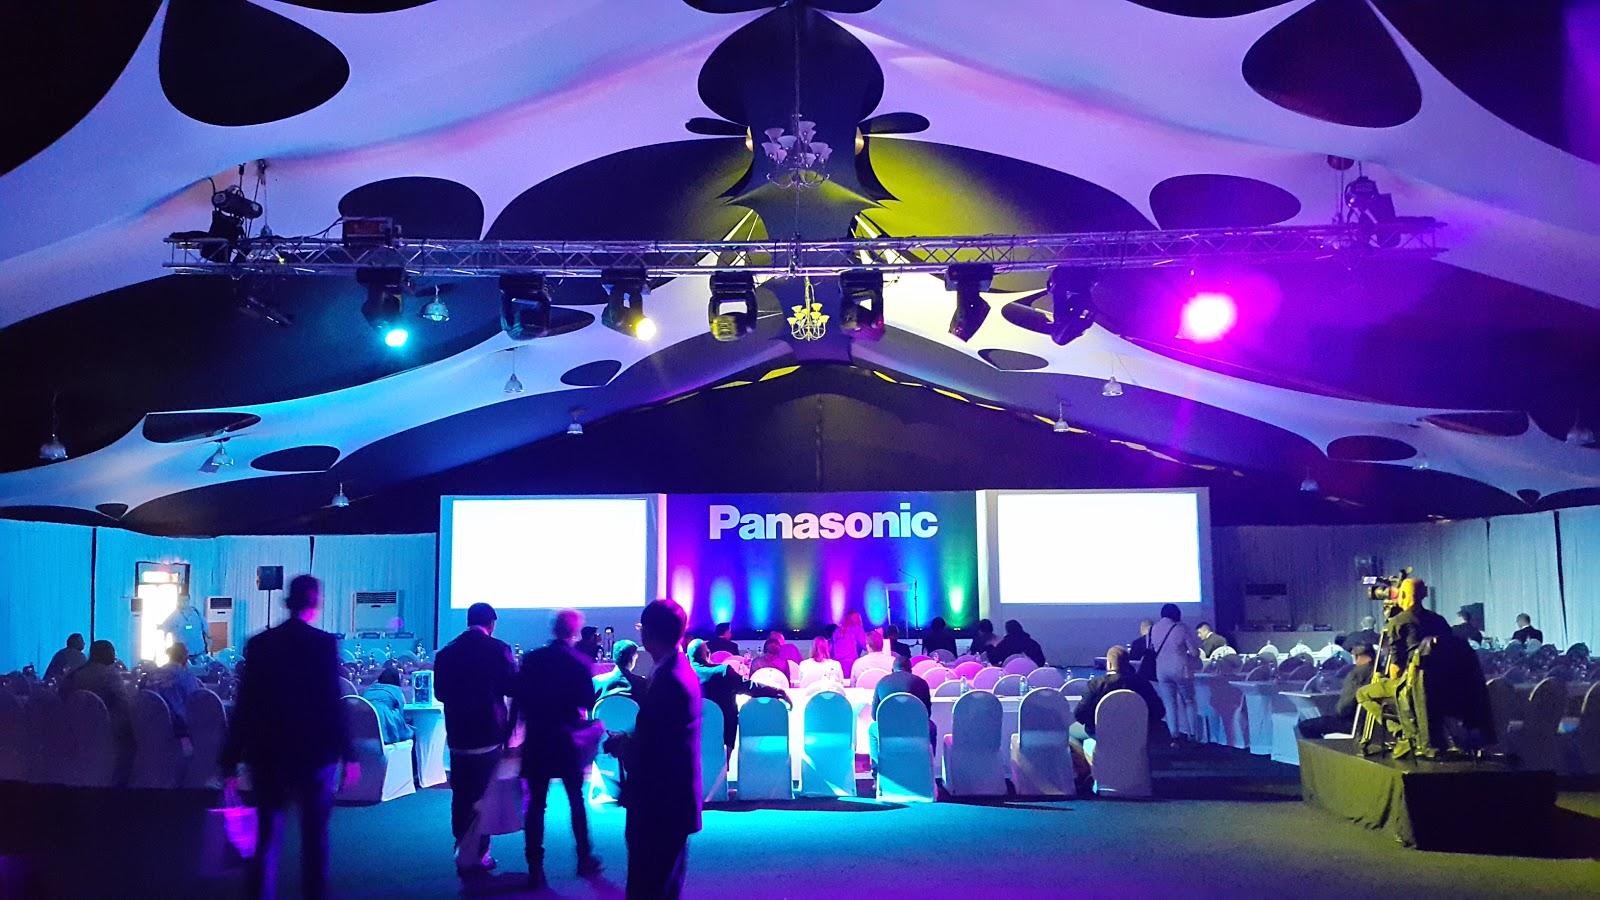 2016 Panasonic Expo South Africa